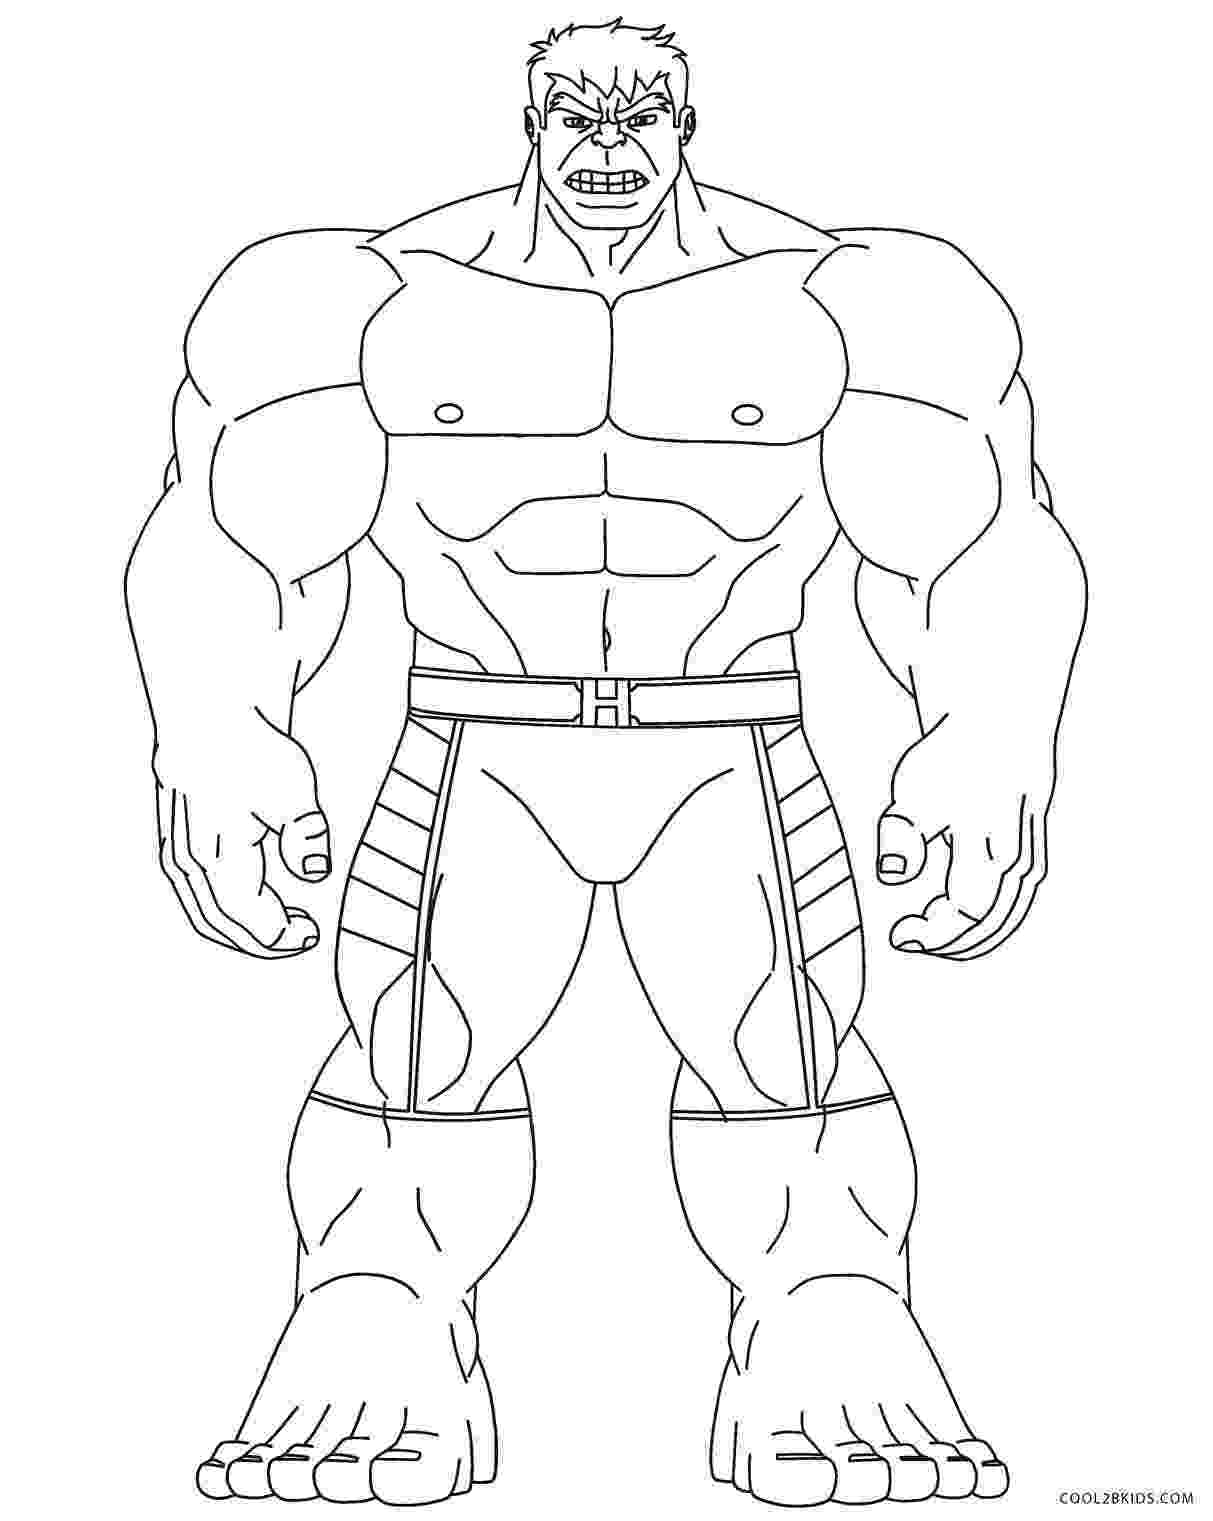 incredible hulk coloring free printable hulk coloring pages for kids cool2bkids coloring hulk incredible 1 1